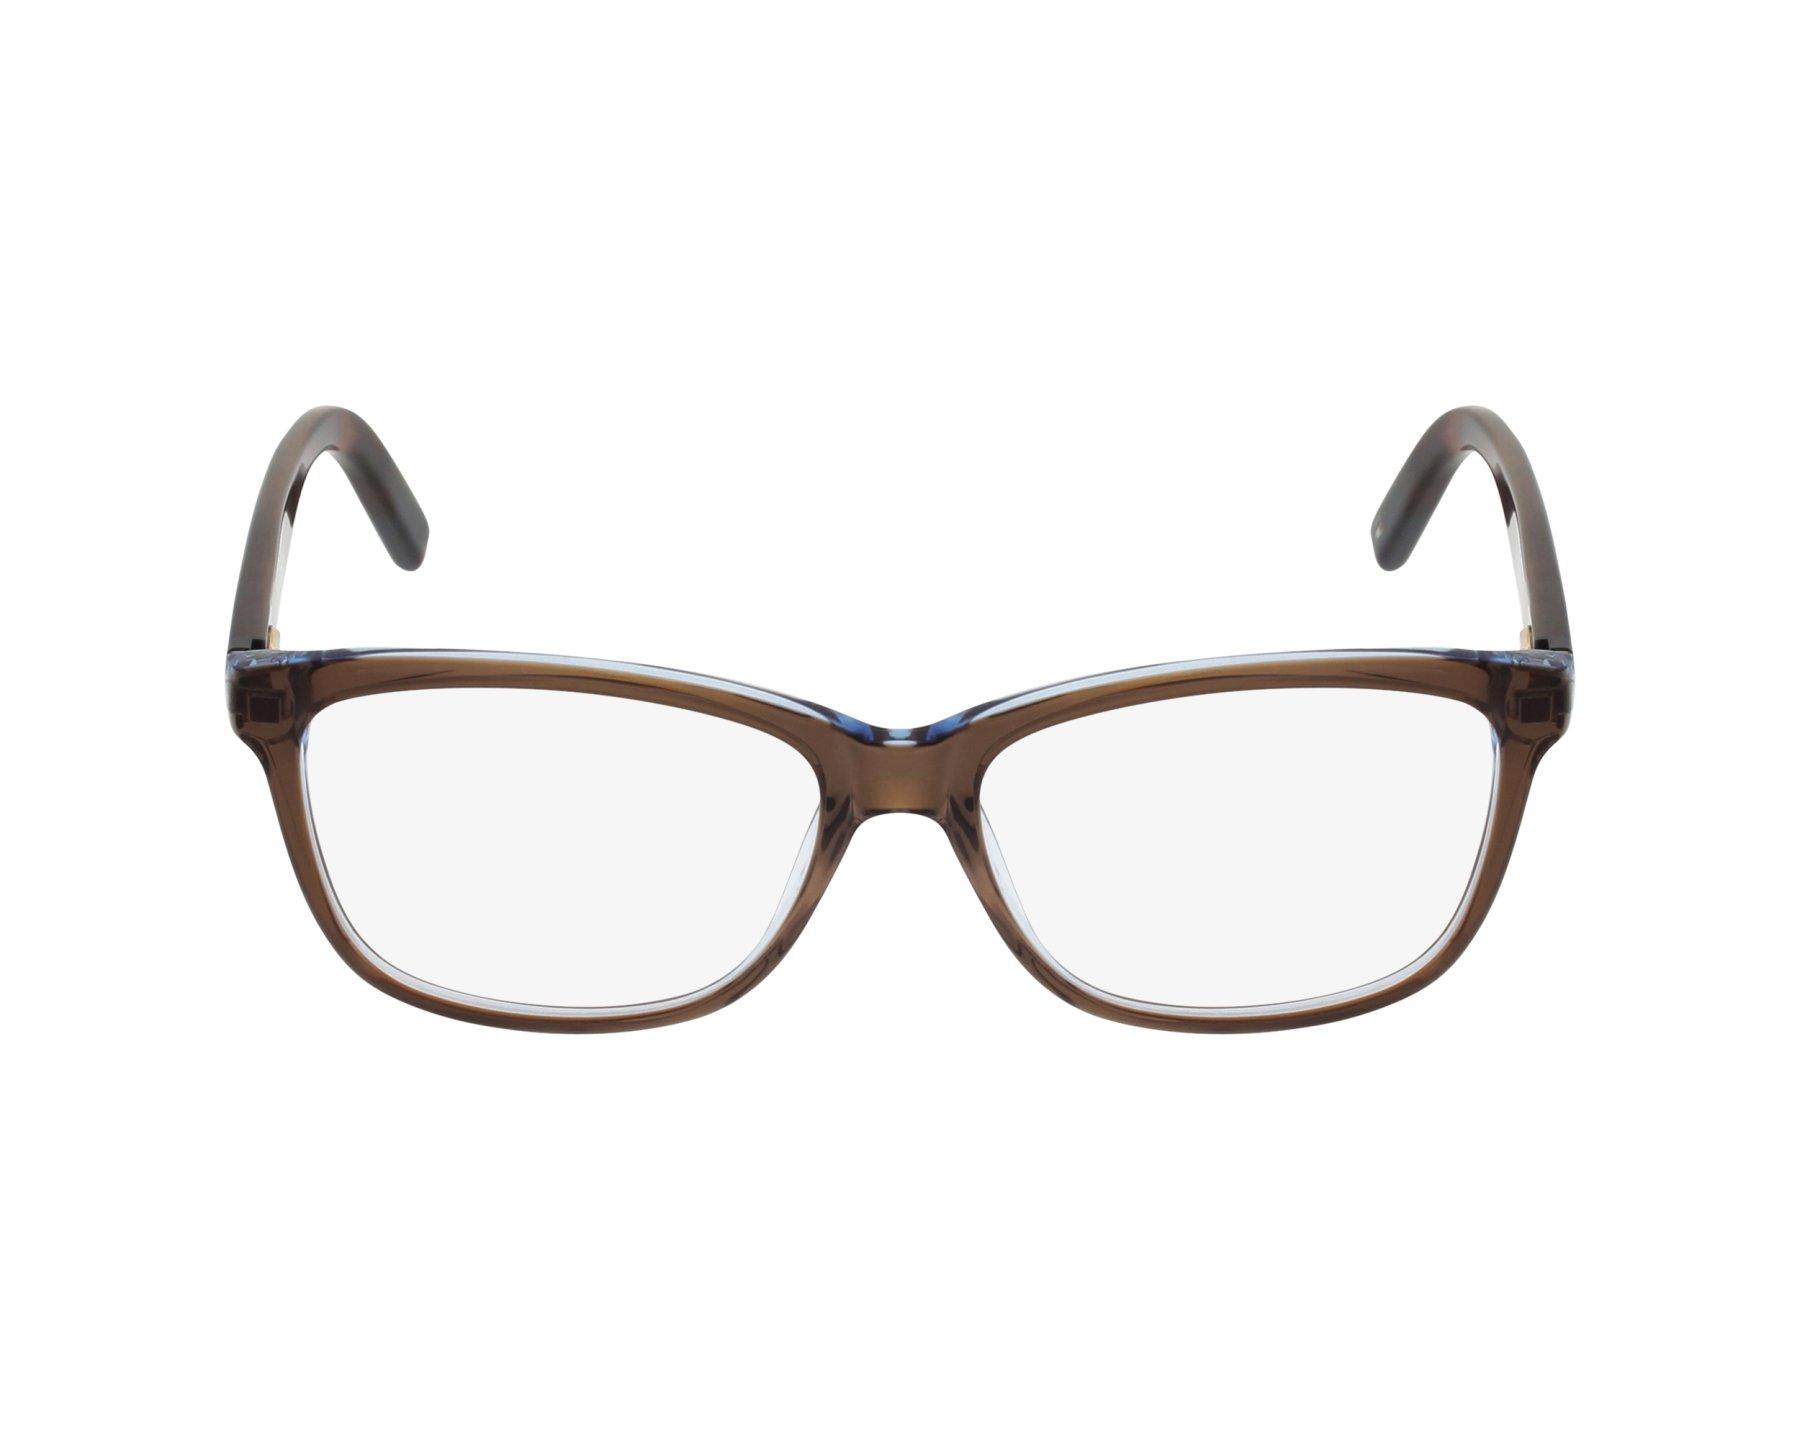 ef06f7eba34452 eyeglasses Tommy Hilfiger TH-1191 784 - Brown Azure profile view